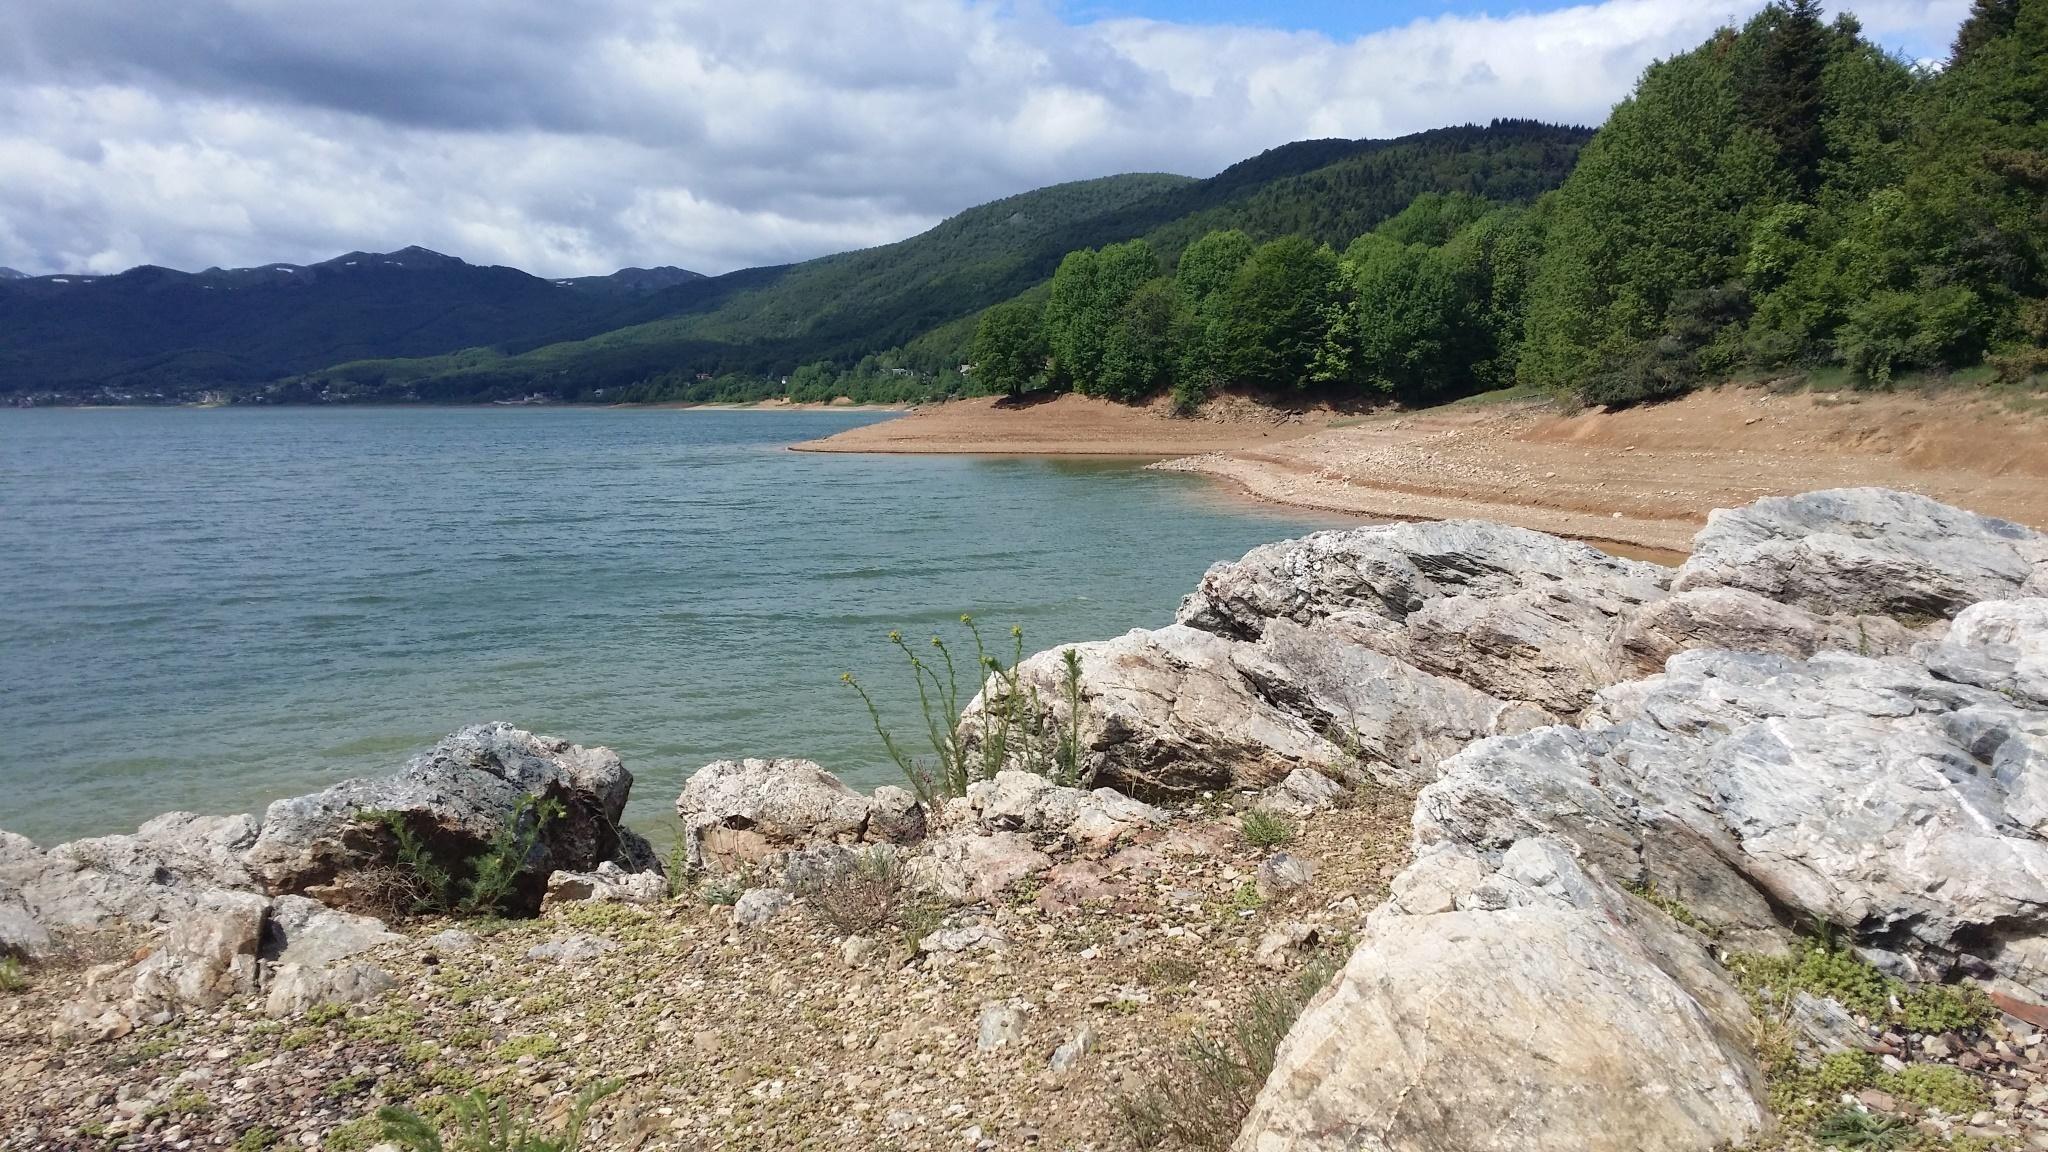 Lake Mavrovo Macedonia [OC][2048x1152] Ipad air